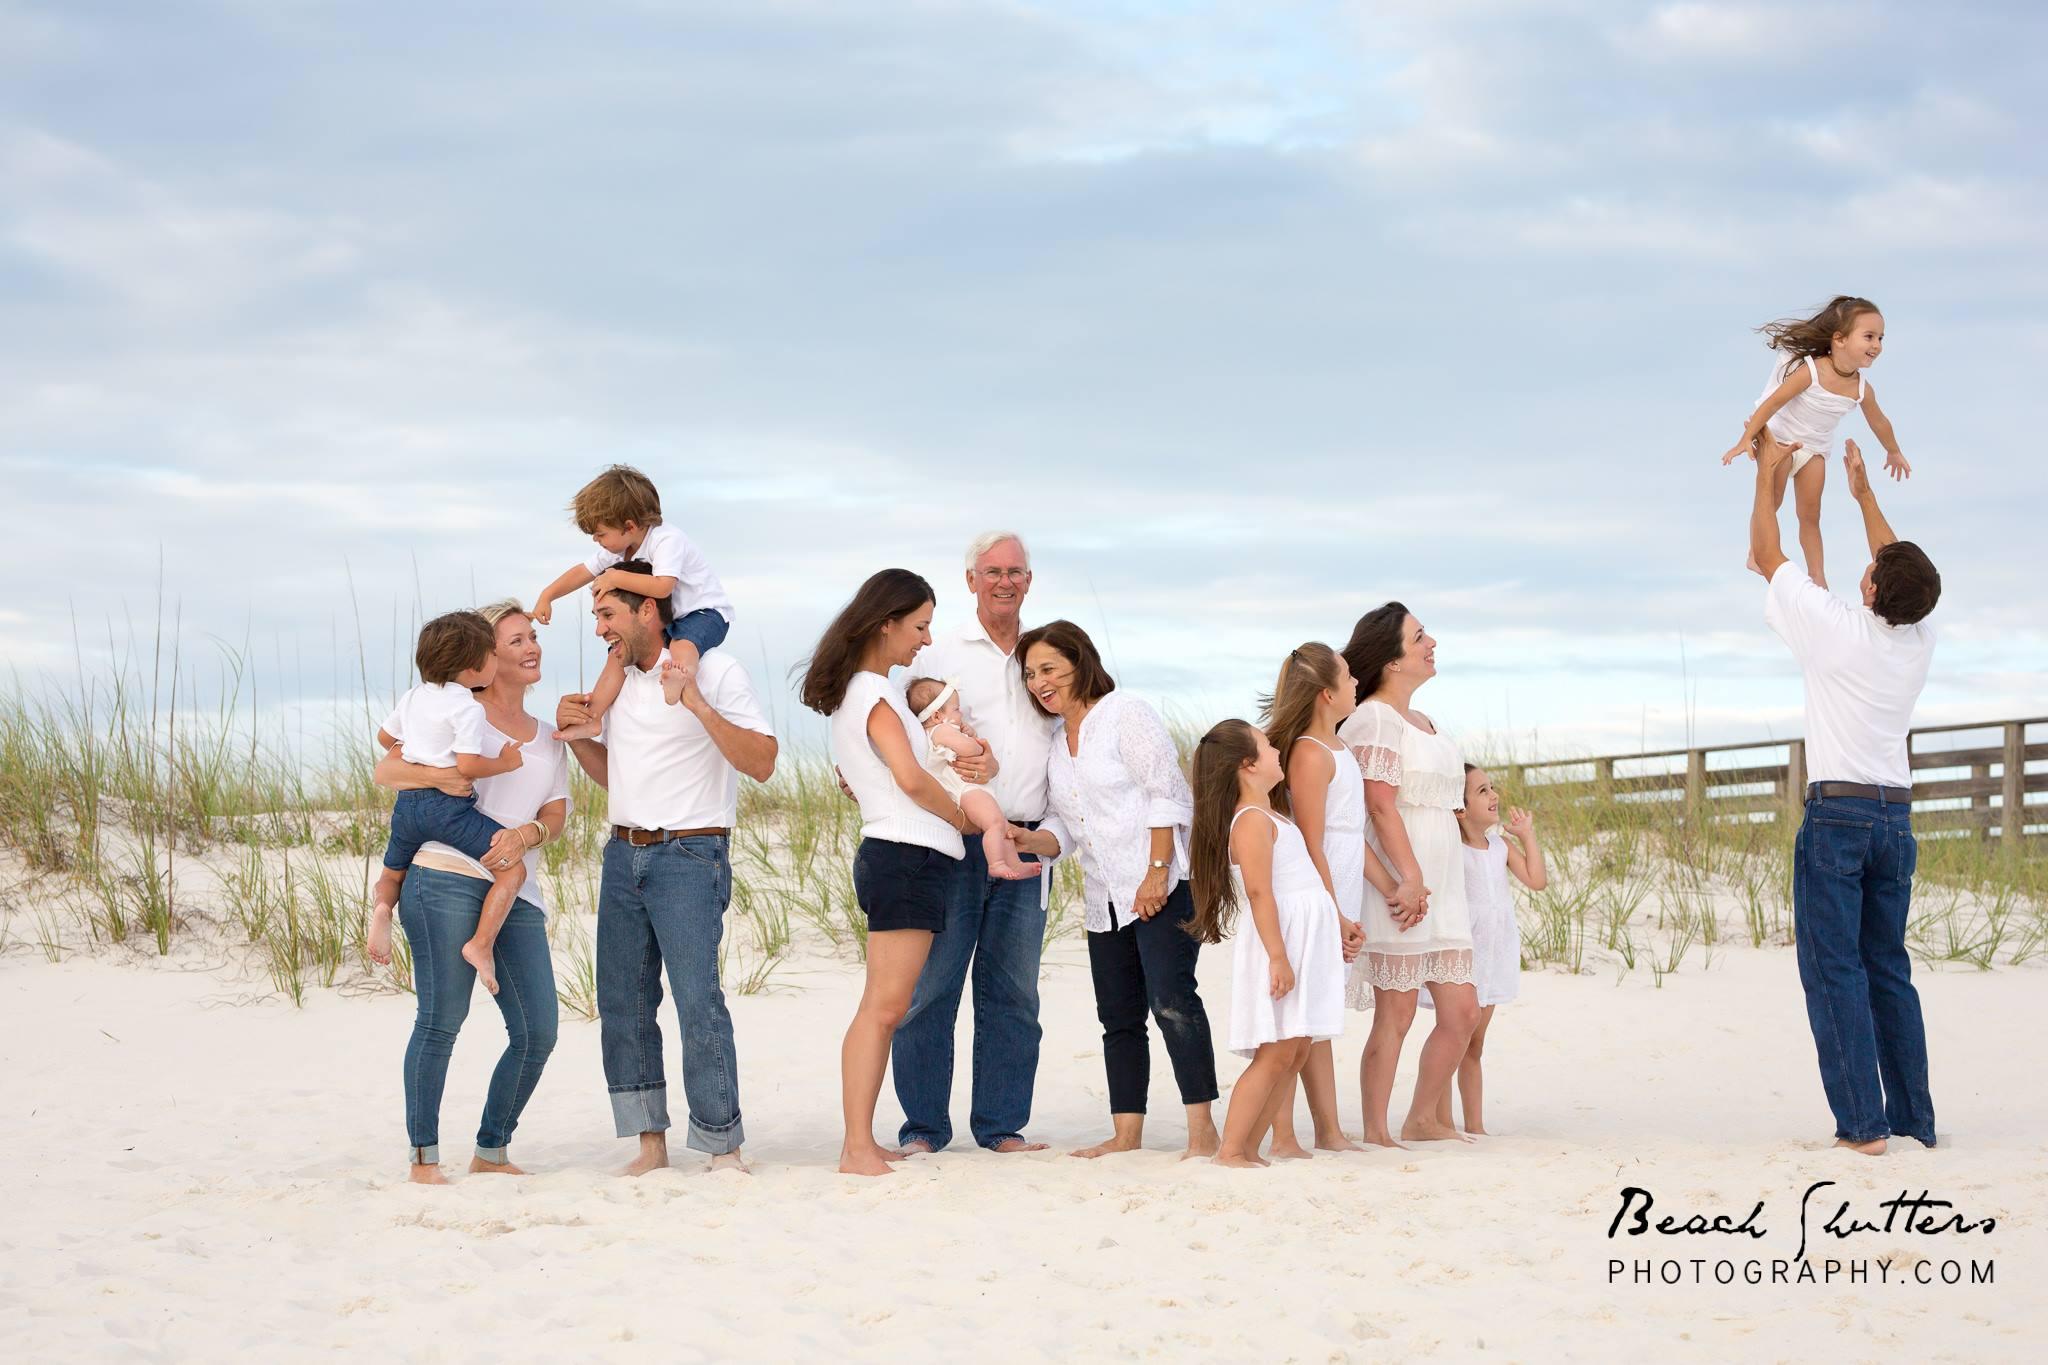 things to do in Orange Beach call Beach Shutters Photography